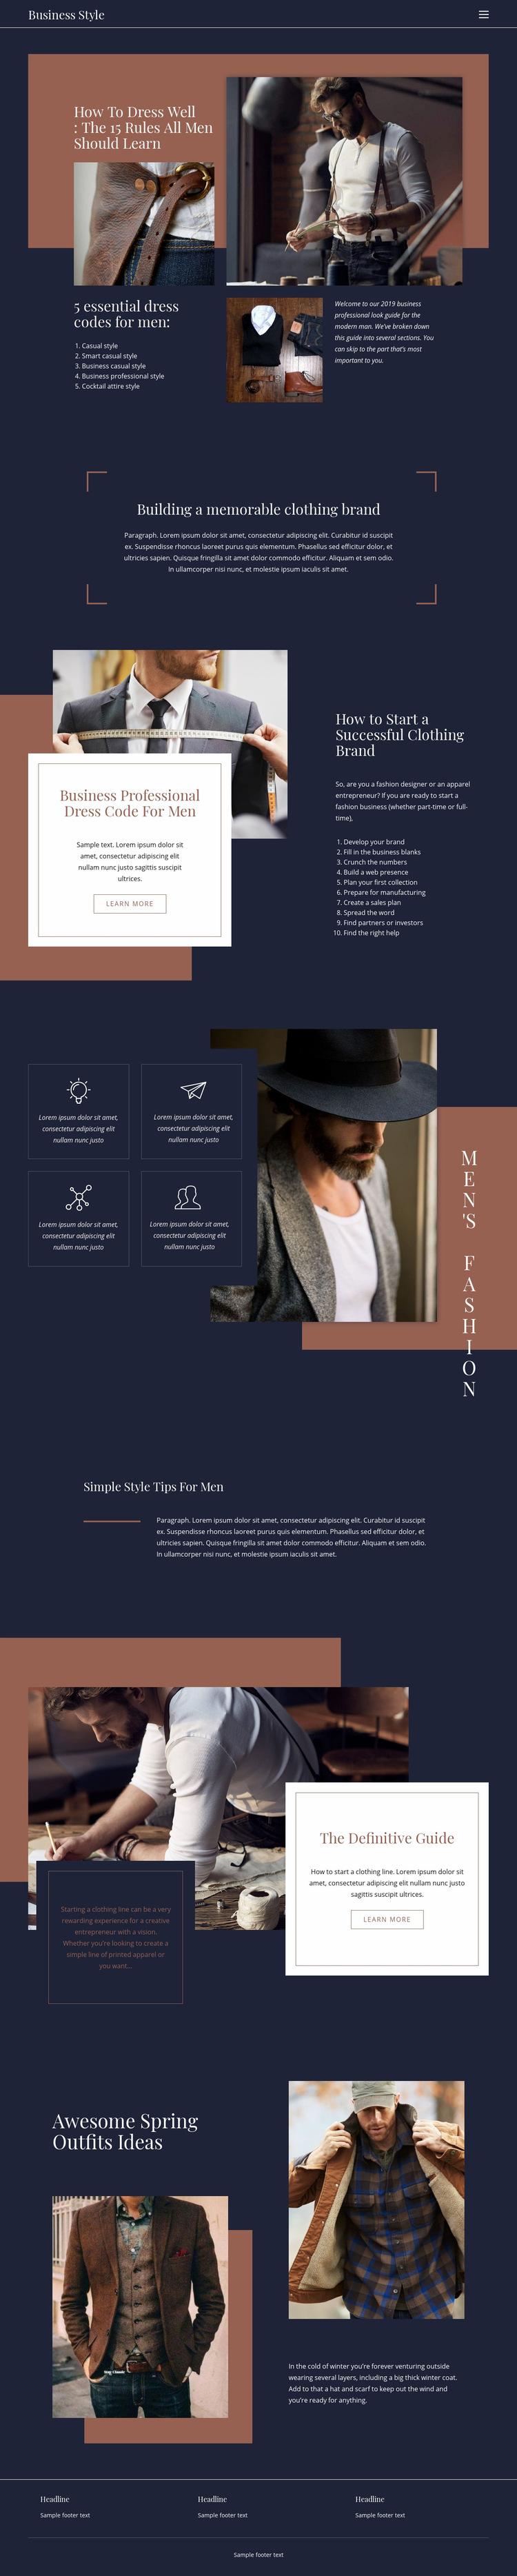 Winning rules of fashion Web Page Design